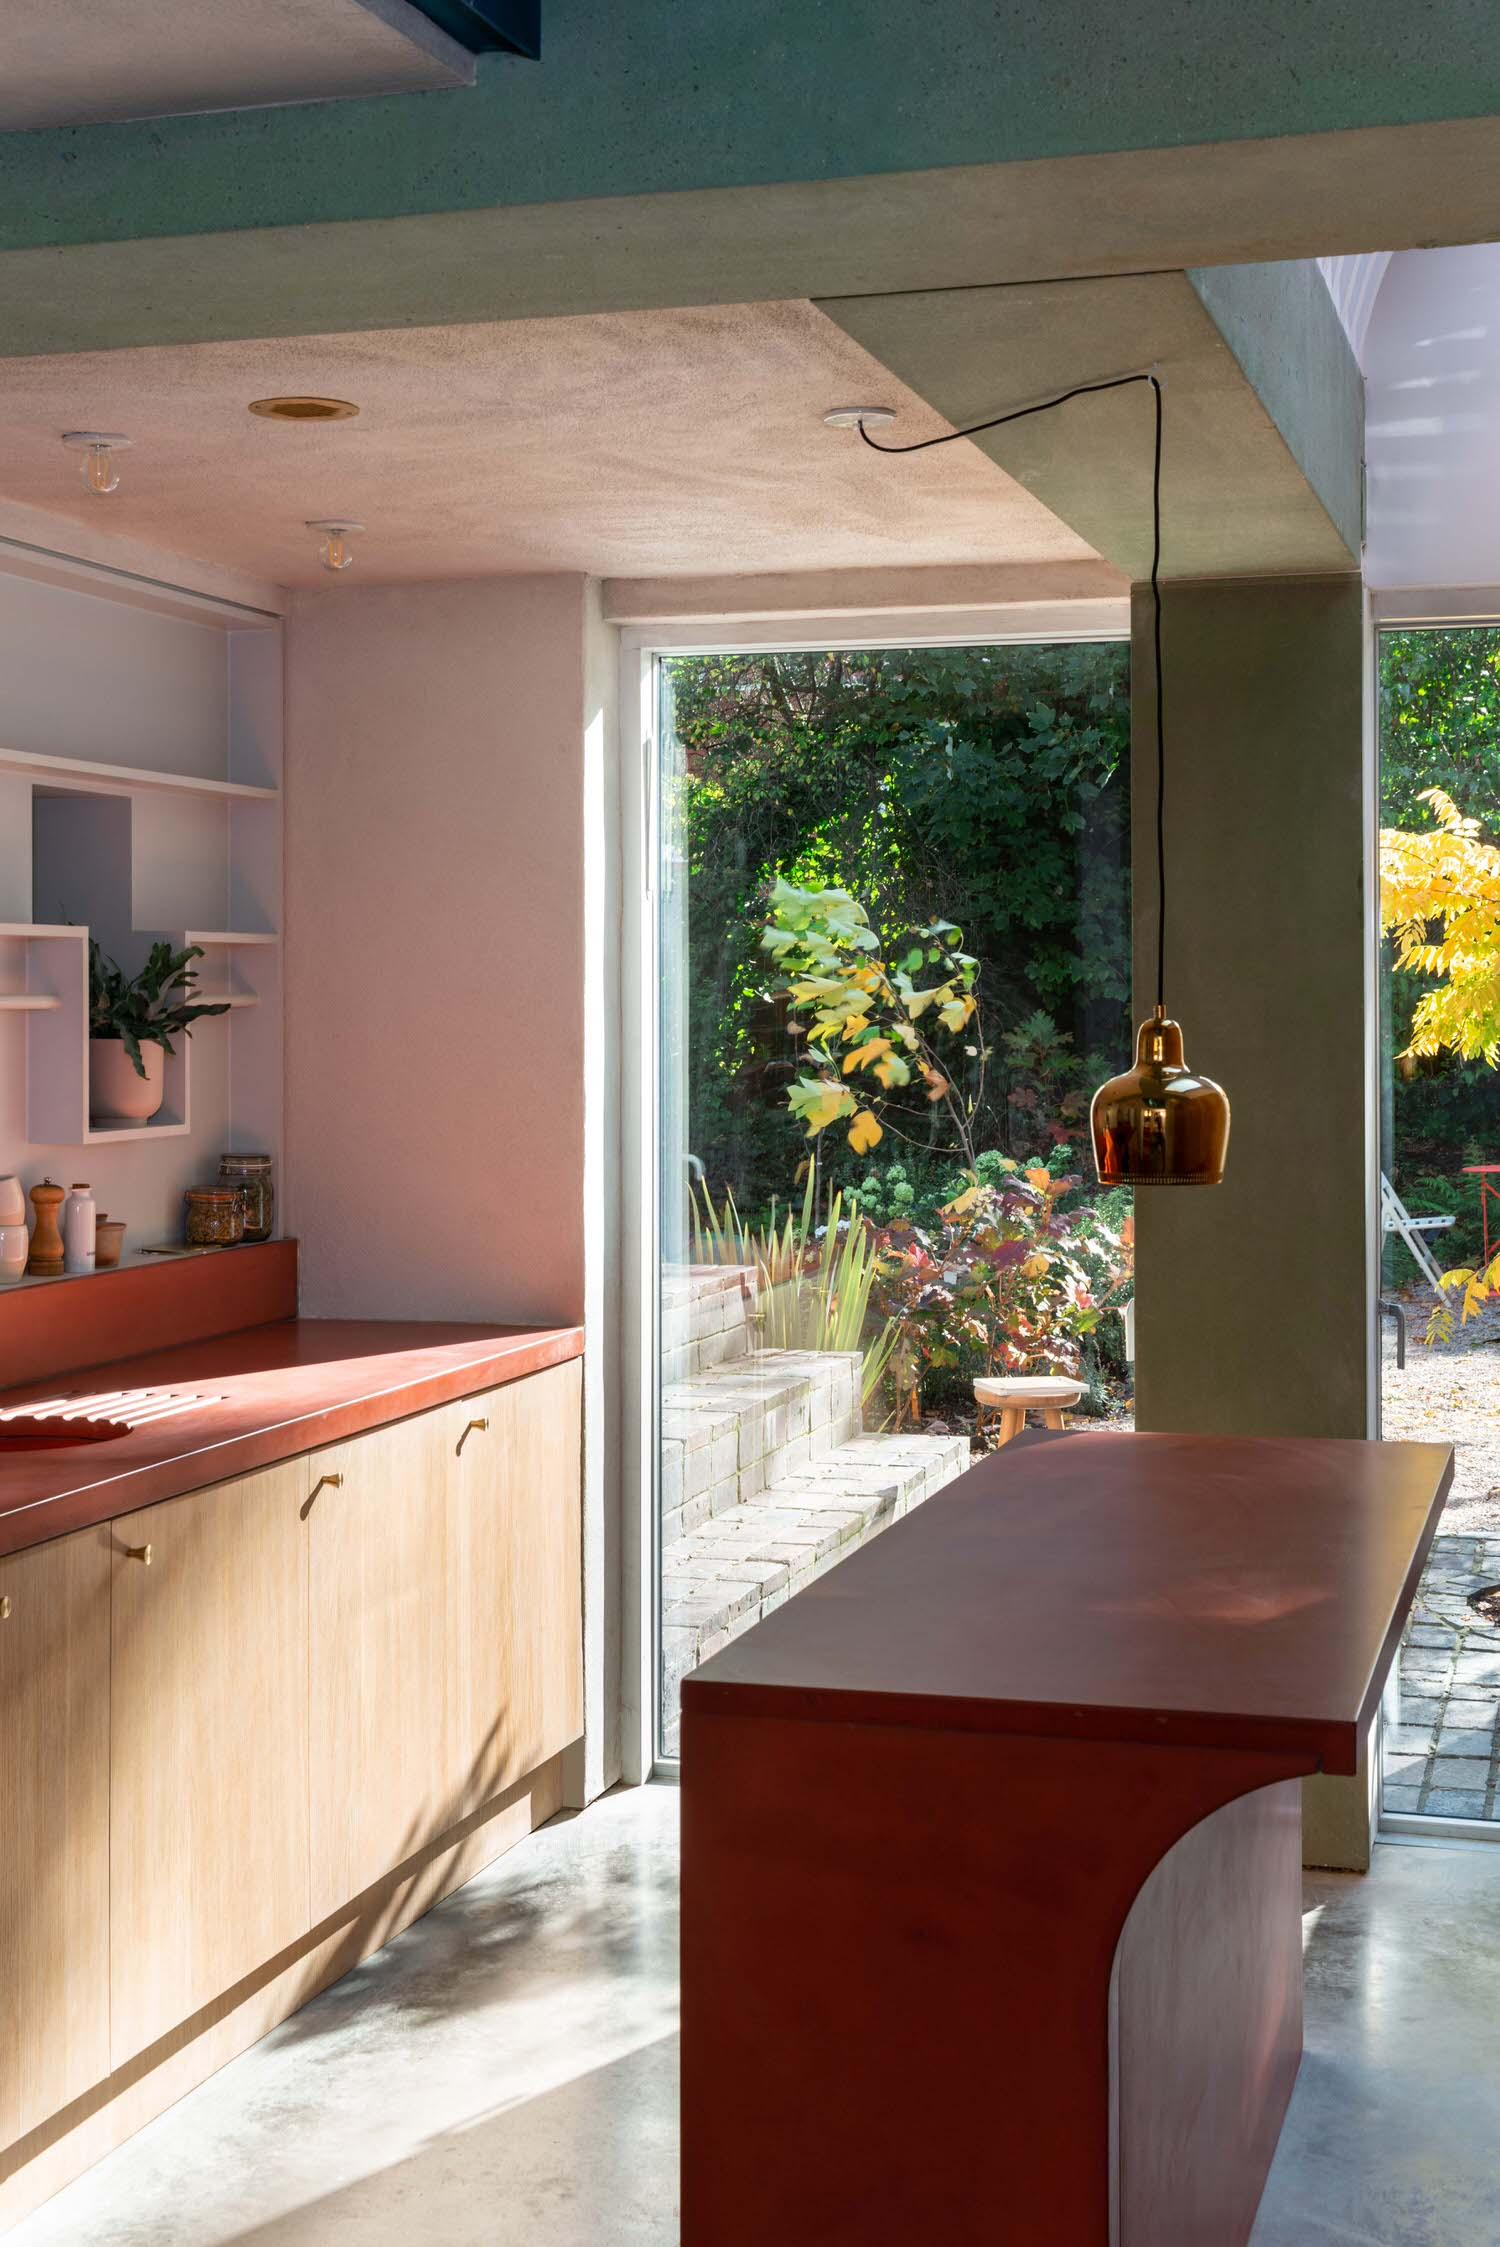 Studio Ben Allen House Recast London Residential Architecture Photo French+tye Yellowtrace 04